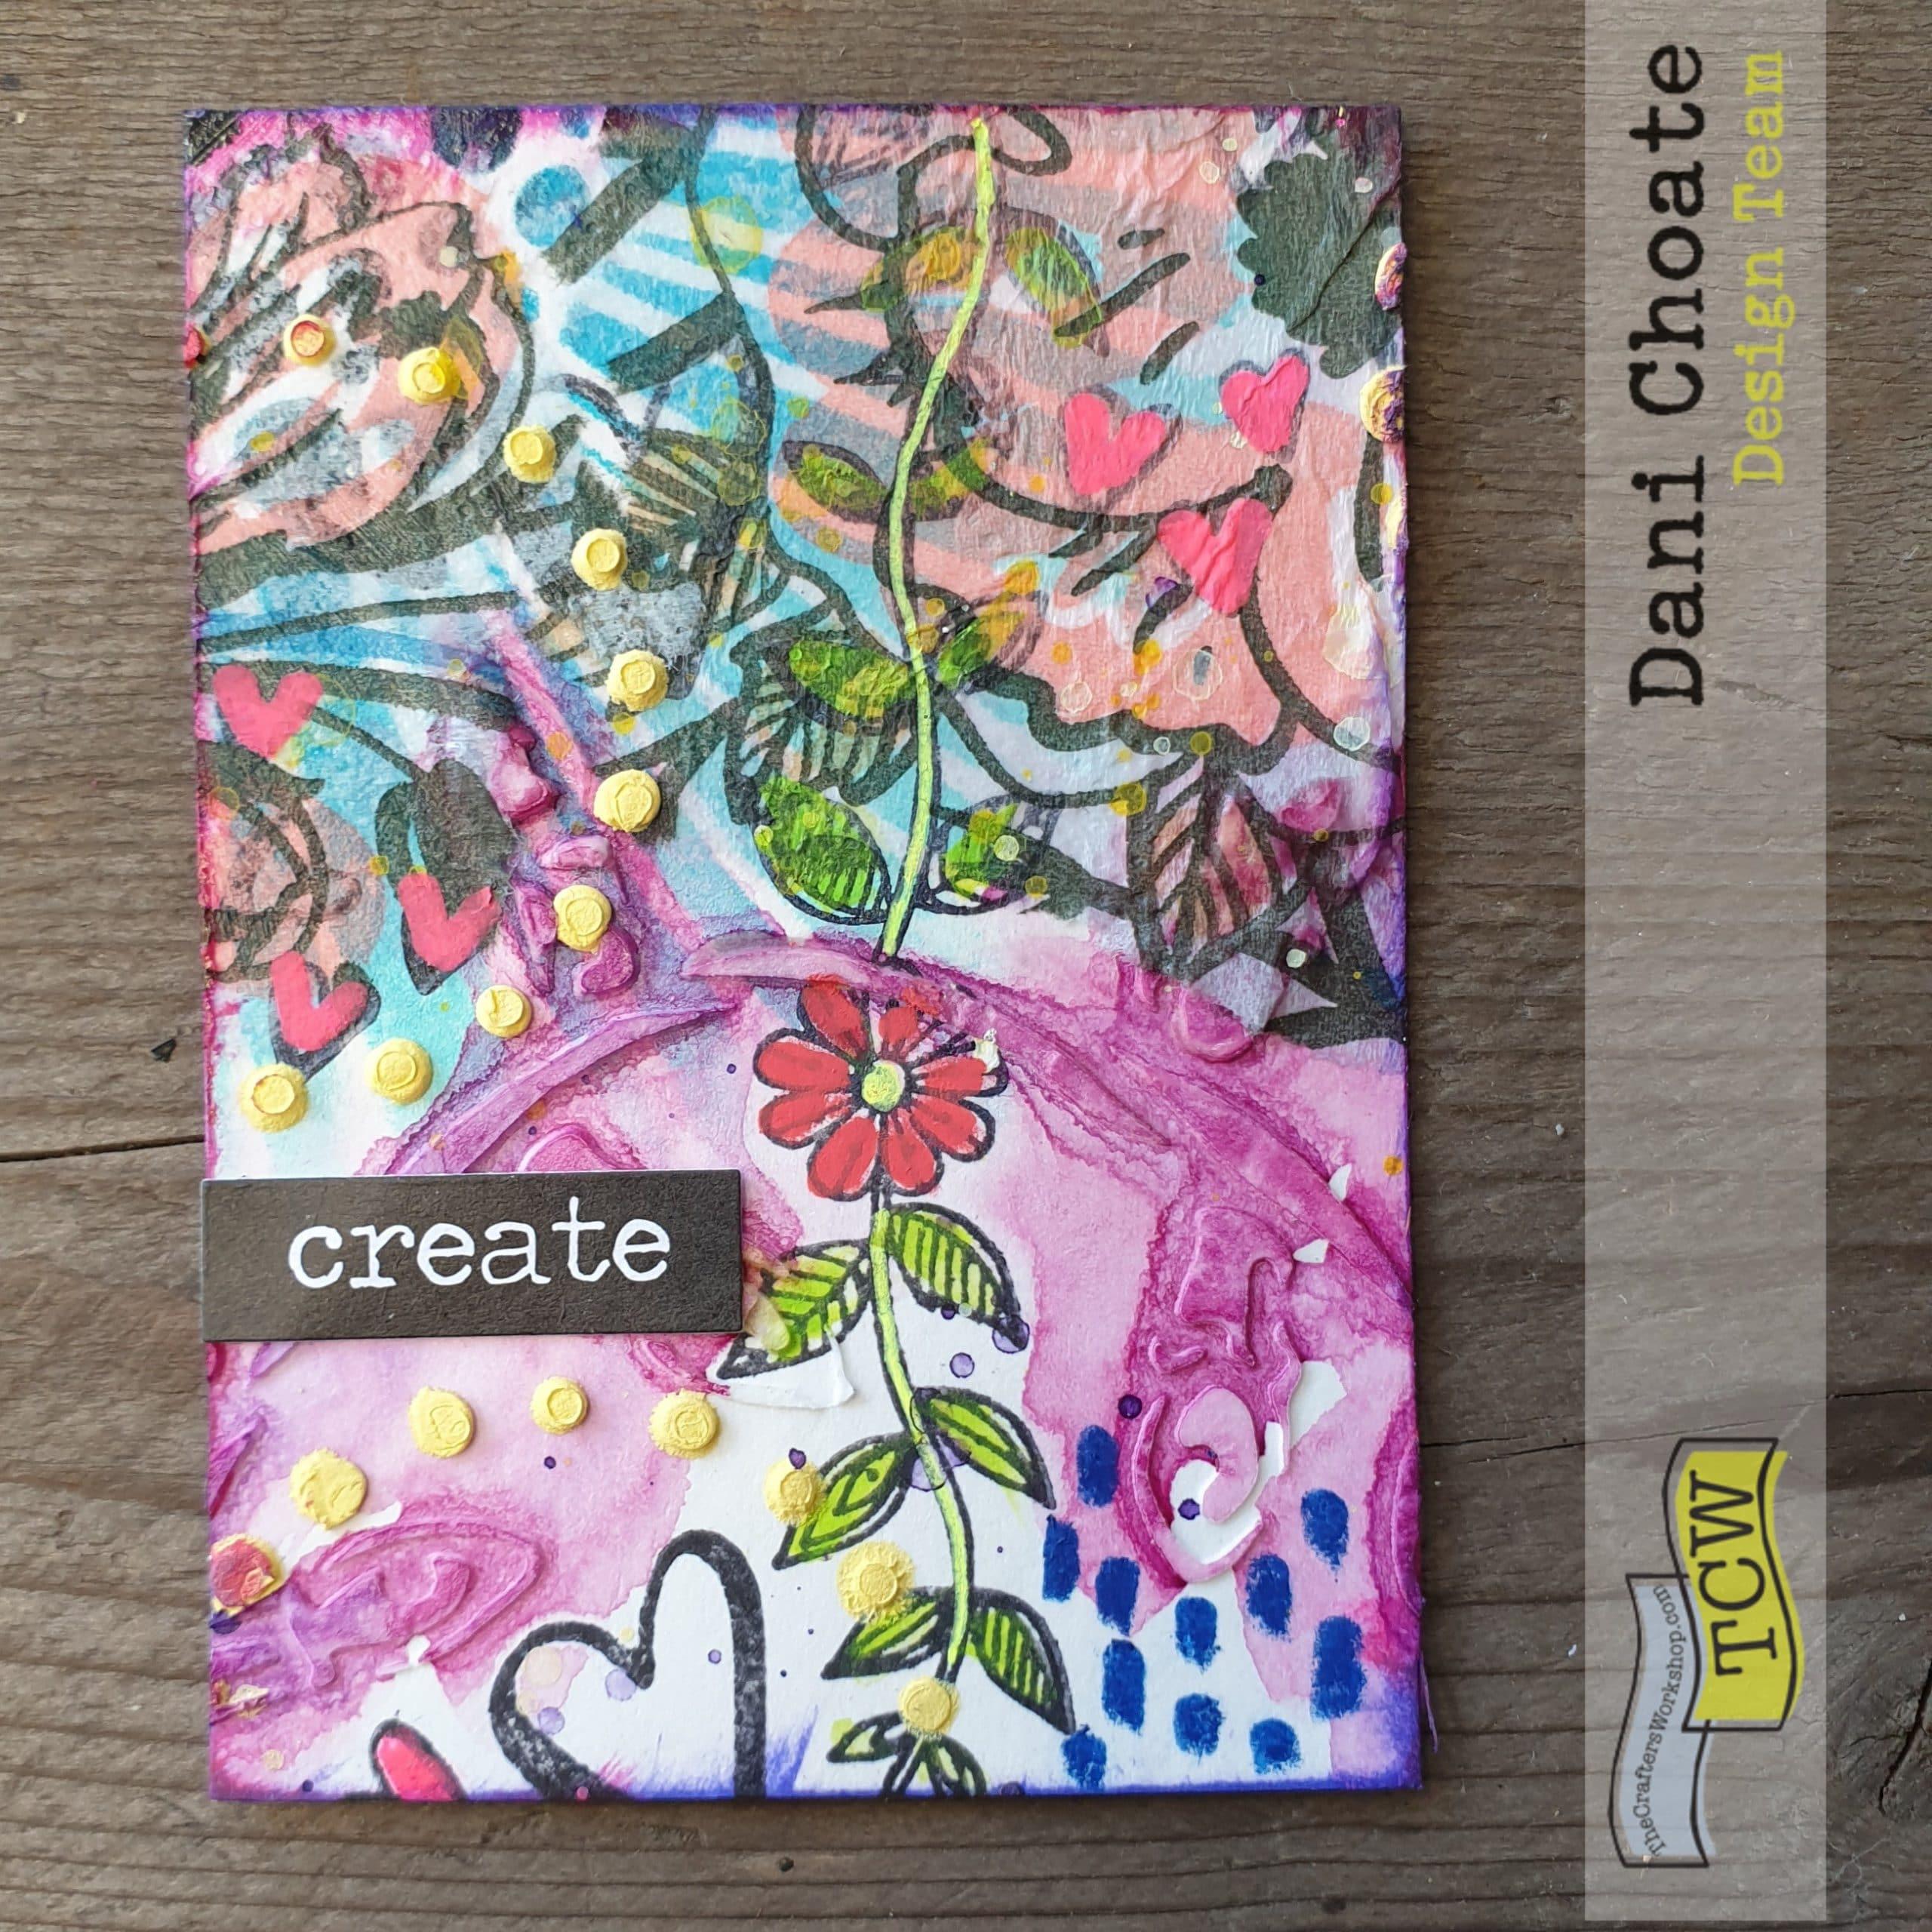 Artist Trading Card - CREATE